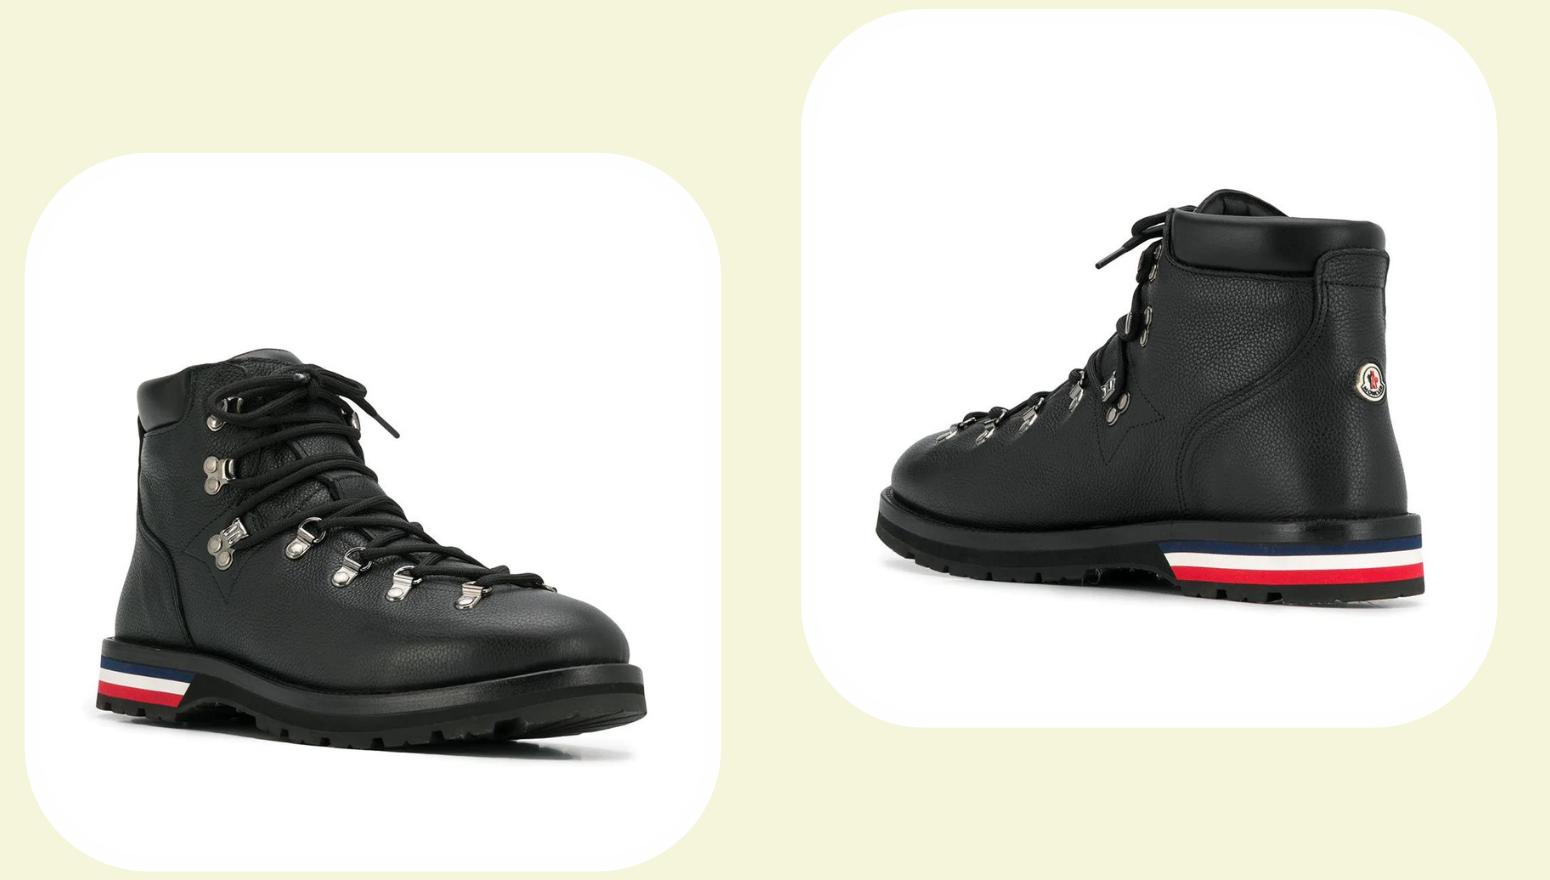 Muške duboke cipele: Za zimu i jesen